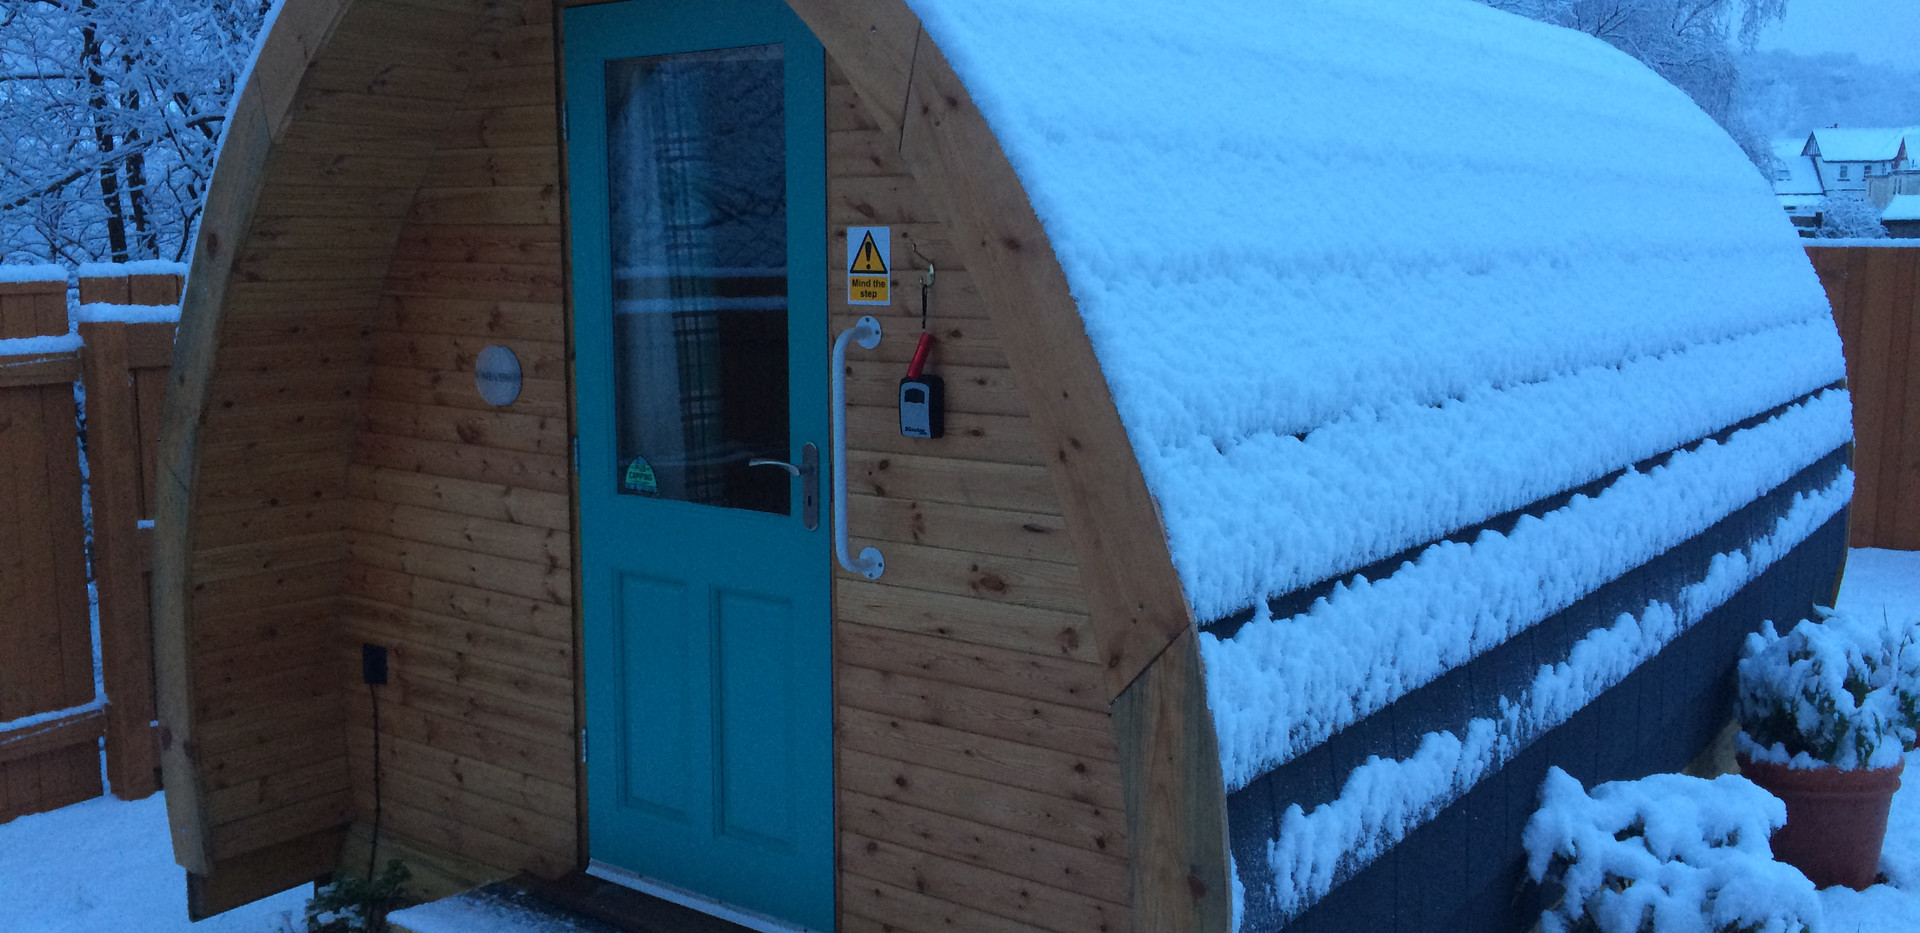 WHWH Nevis Pod snow Jan 2019.JPG